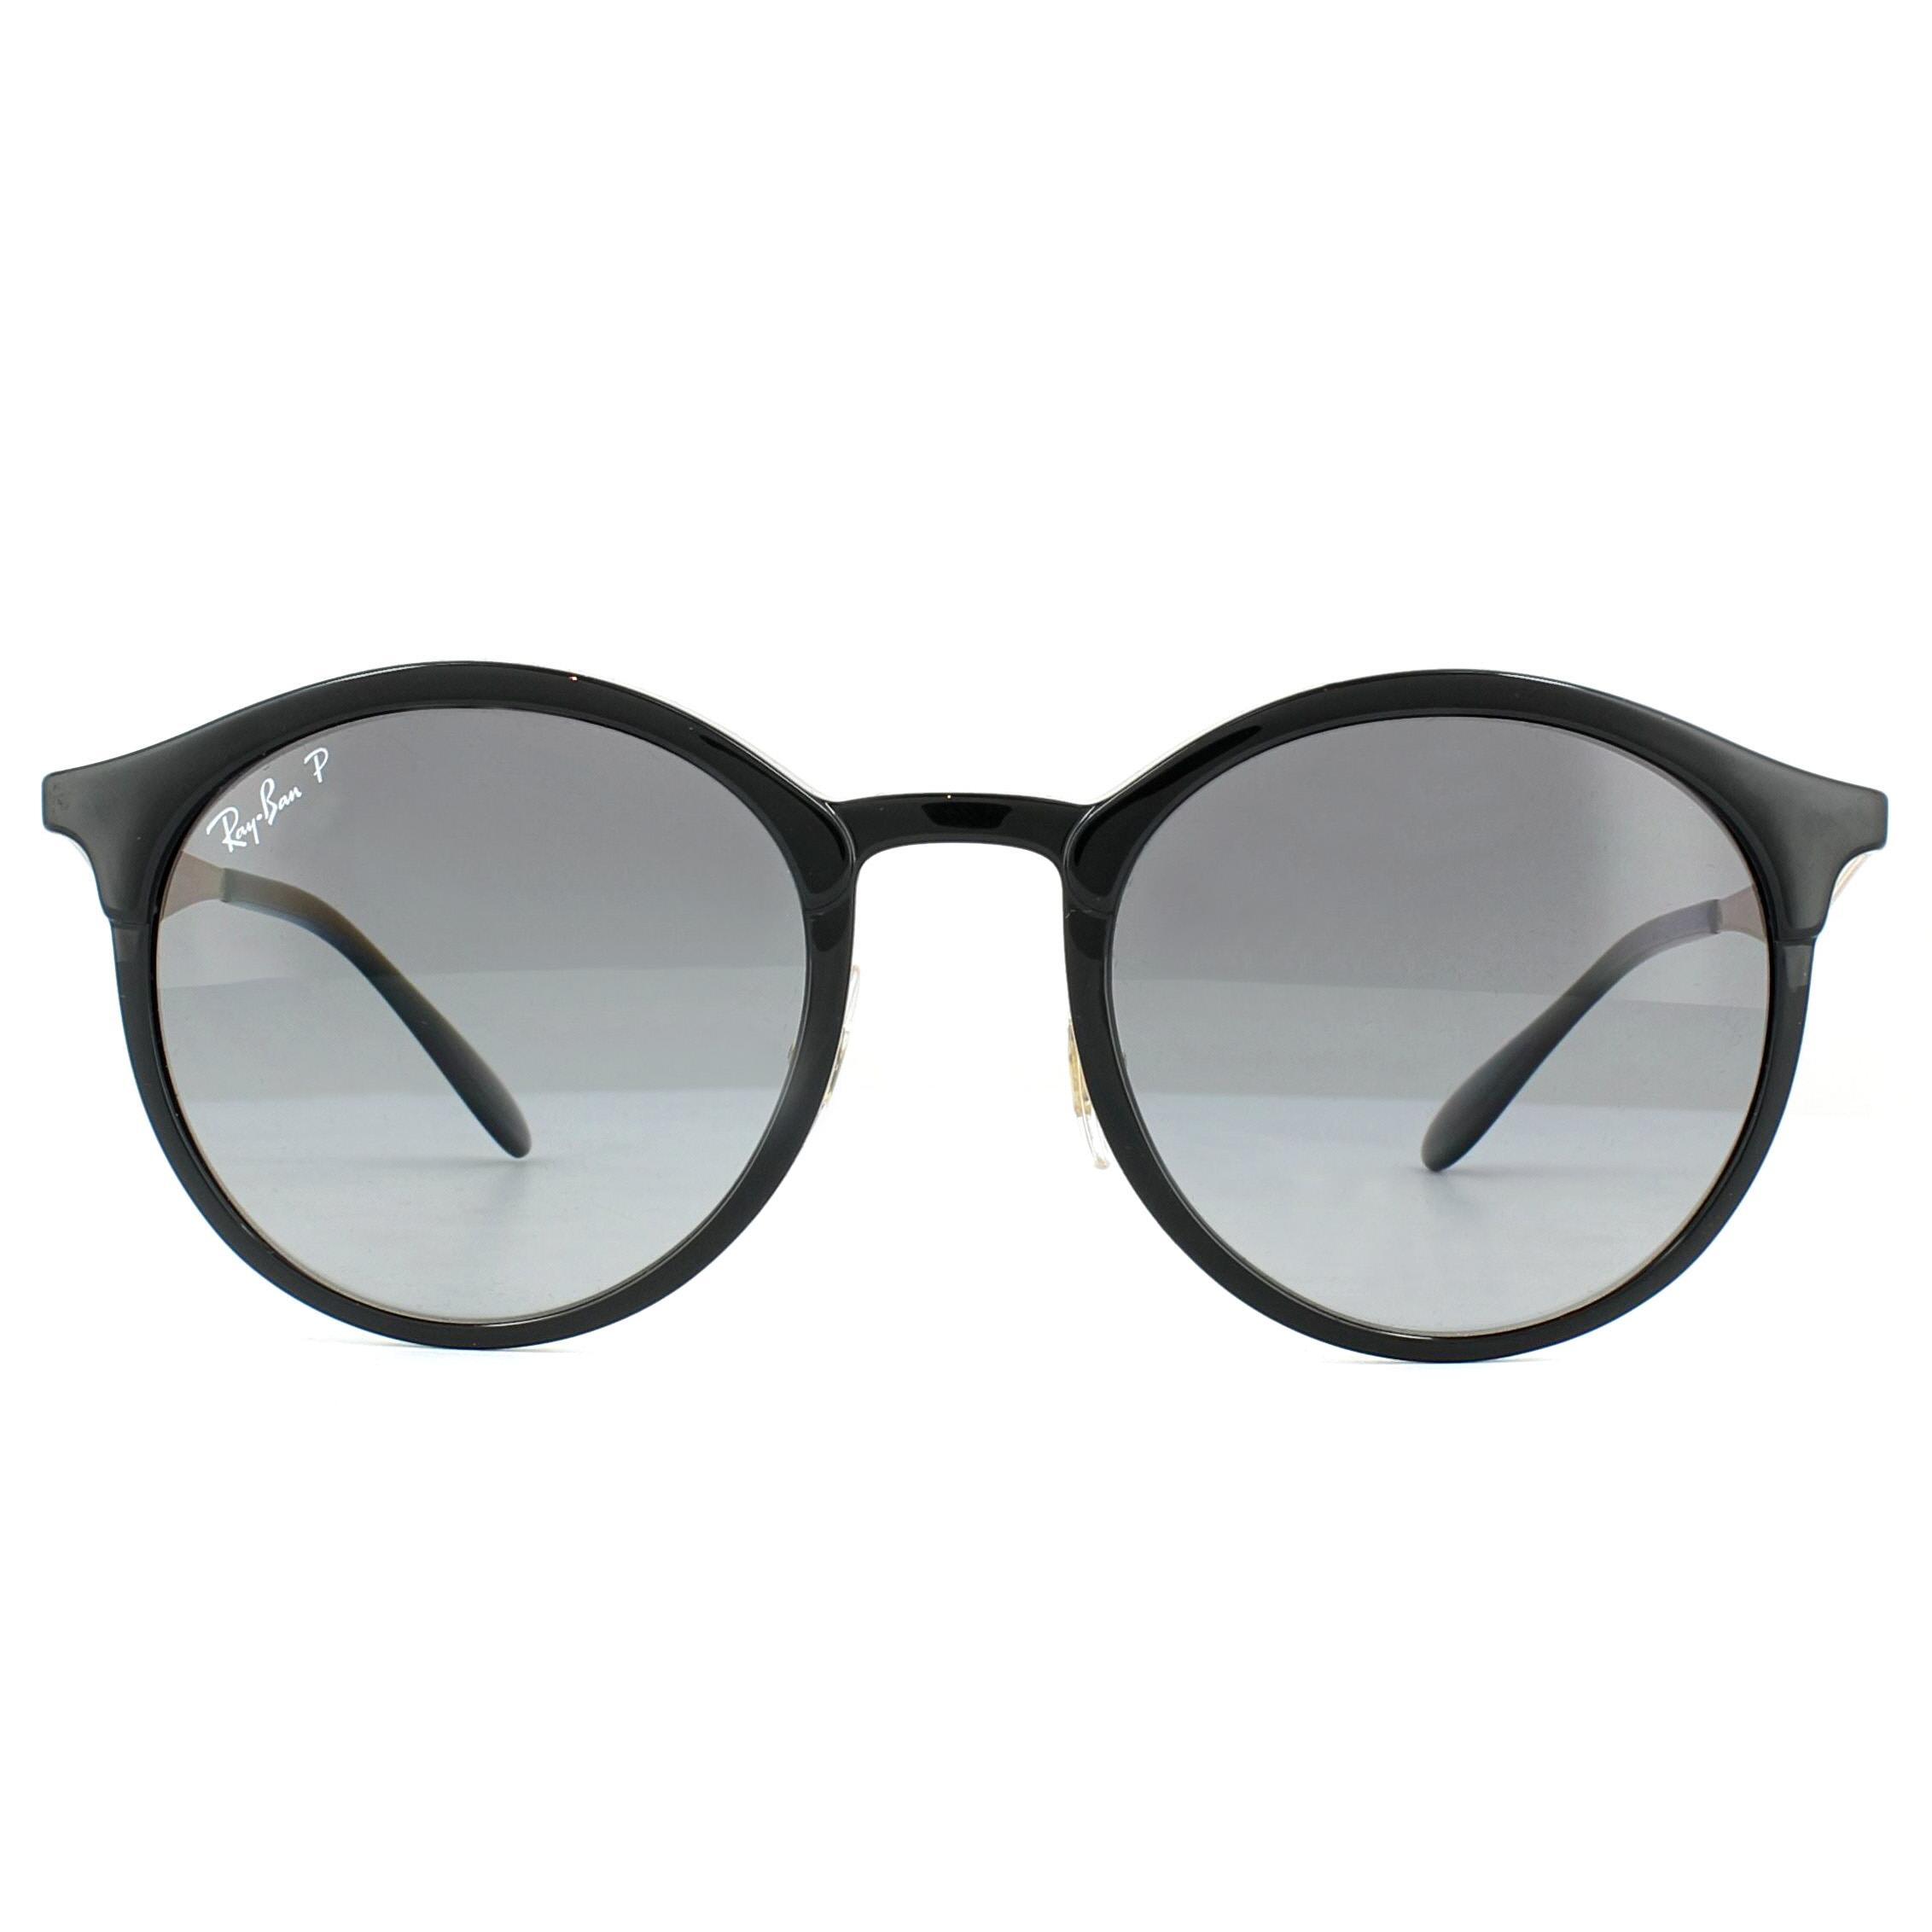 6d88a199c12f90 Sentinel Ray-Ban Sunglasses Emma RB4277 6306T3 Black Grey Gradient Polarized